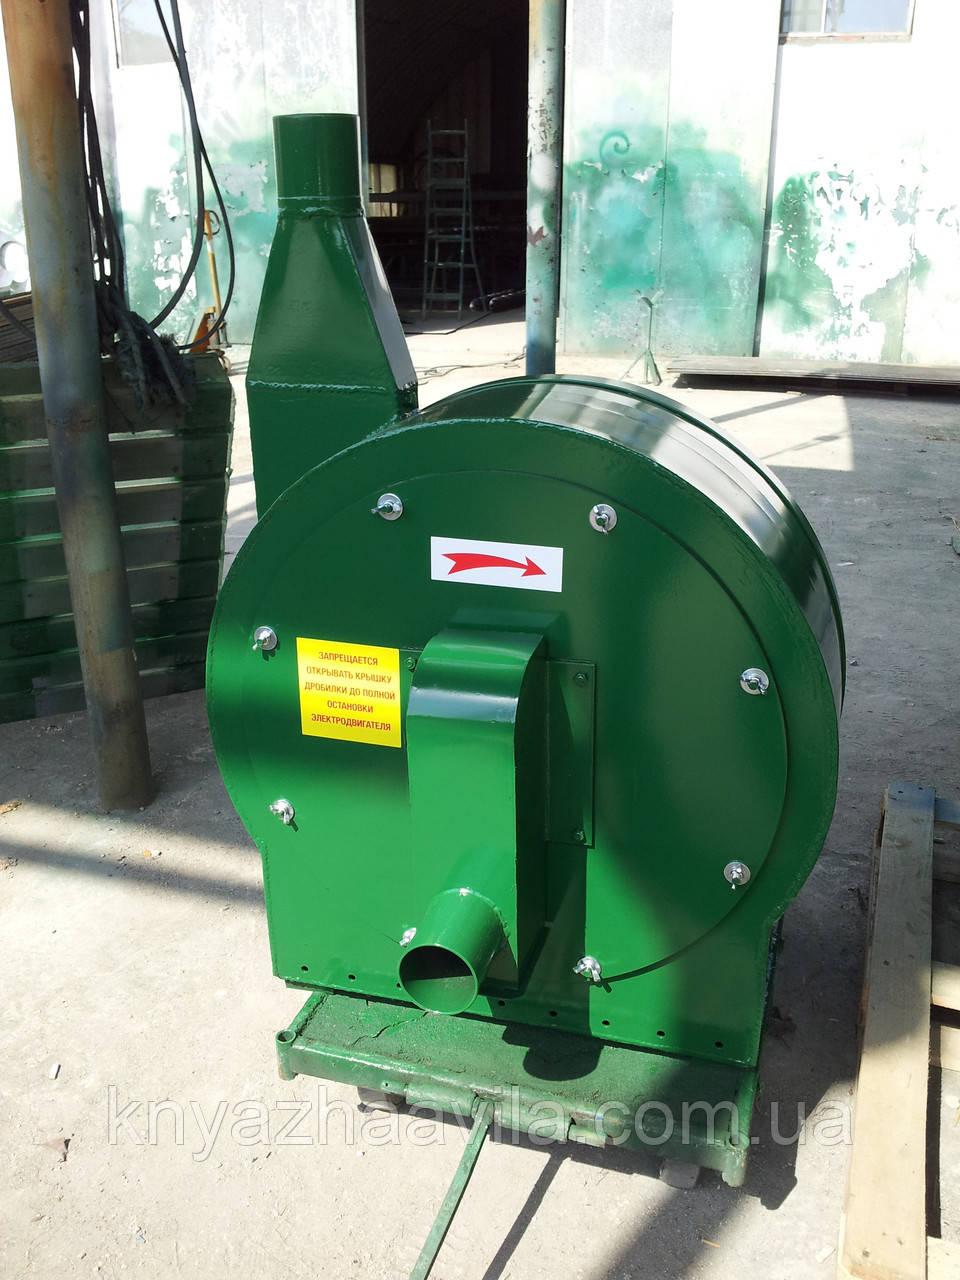 Дробарка молоткова нагнітальна ДМ-002н-ПП, 18,5 кВт